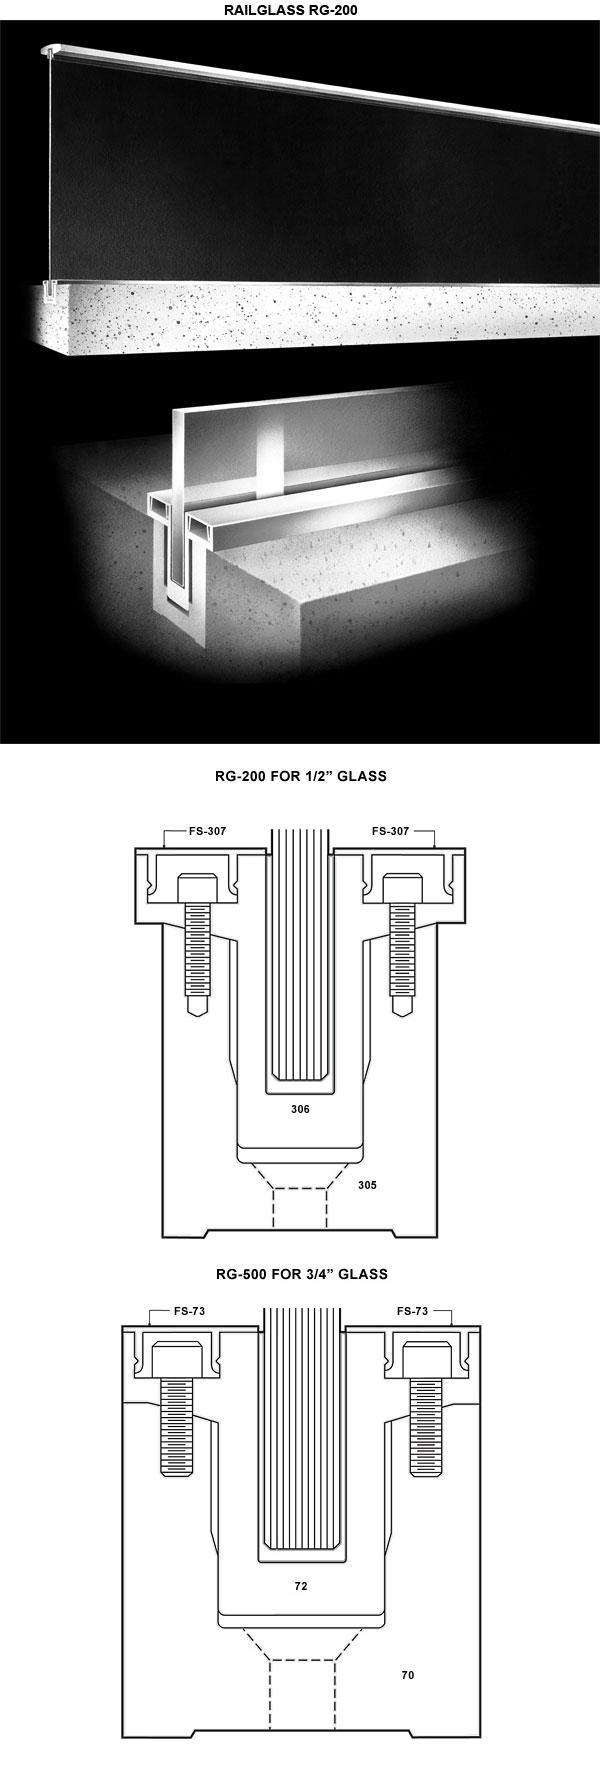 Railglass Two Piece Mounting Base System